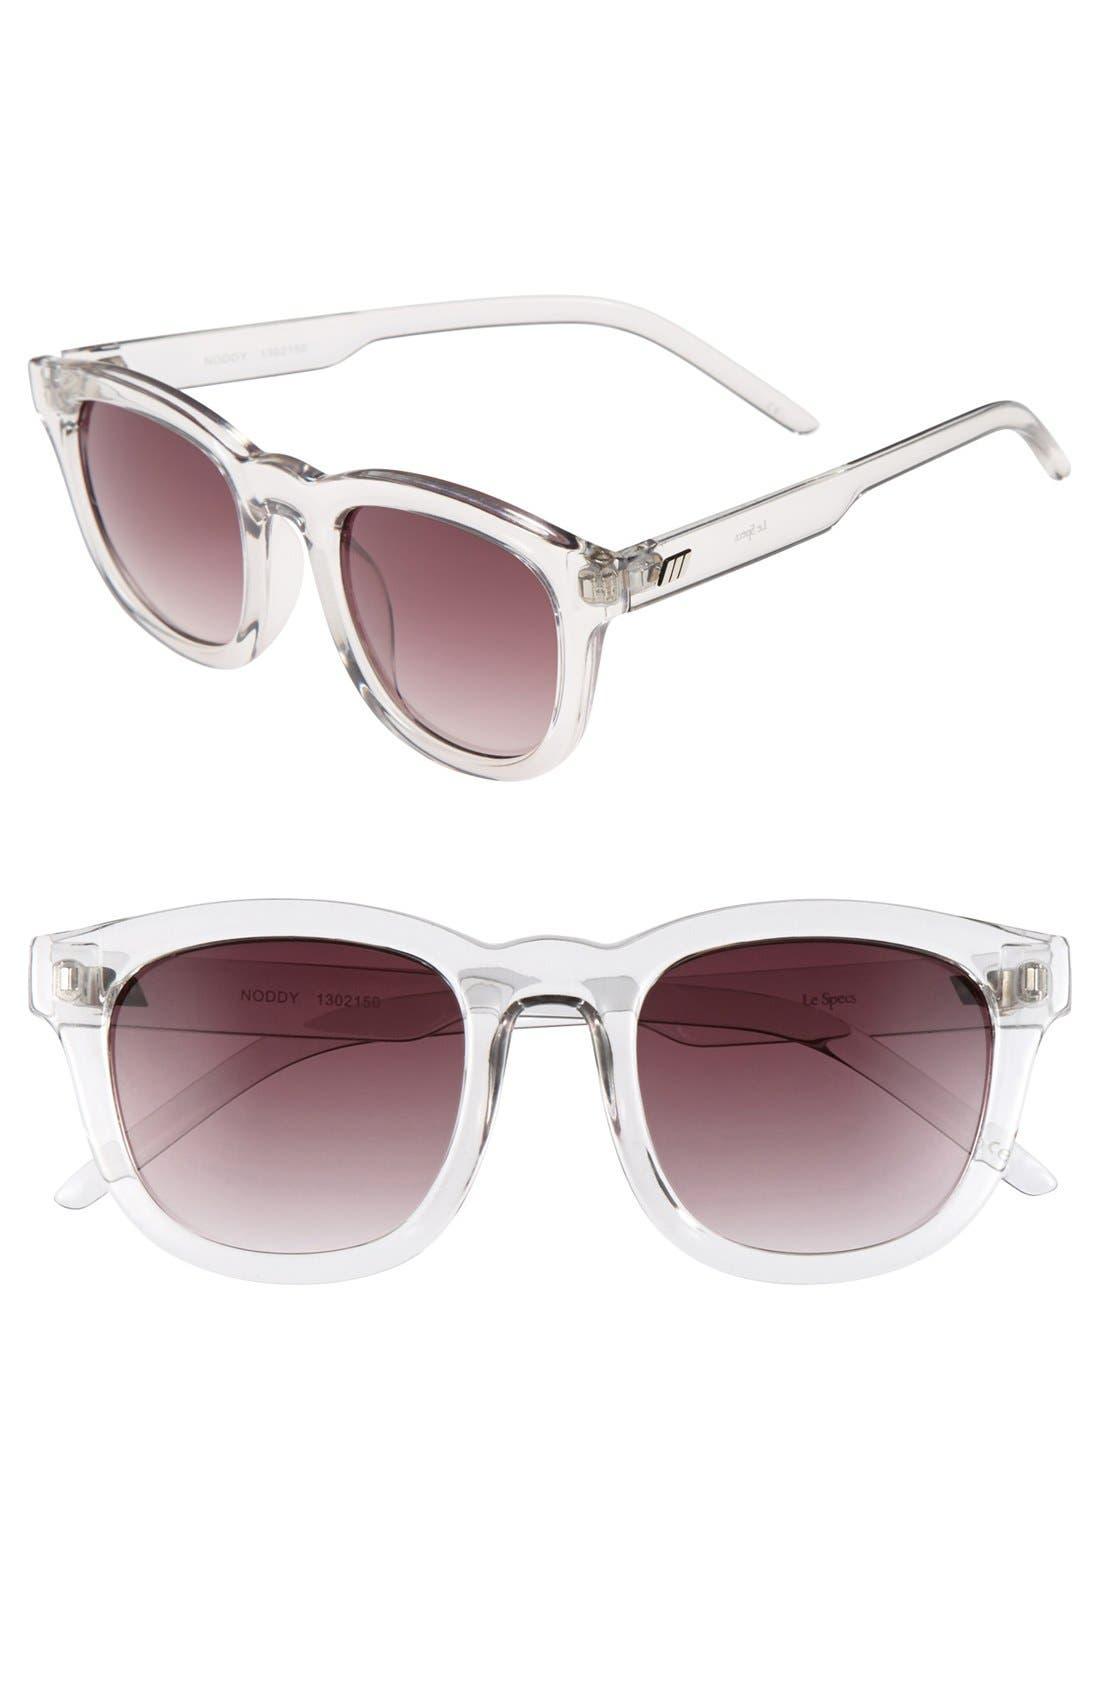 Alternate Image 1 Selected - Le Specs 'Noddy' 49mm Retro Sunglasses